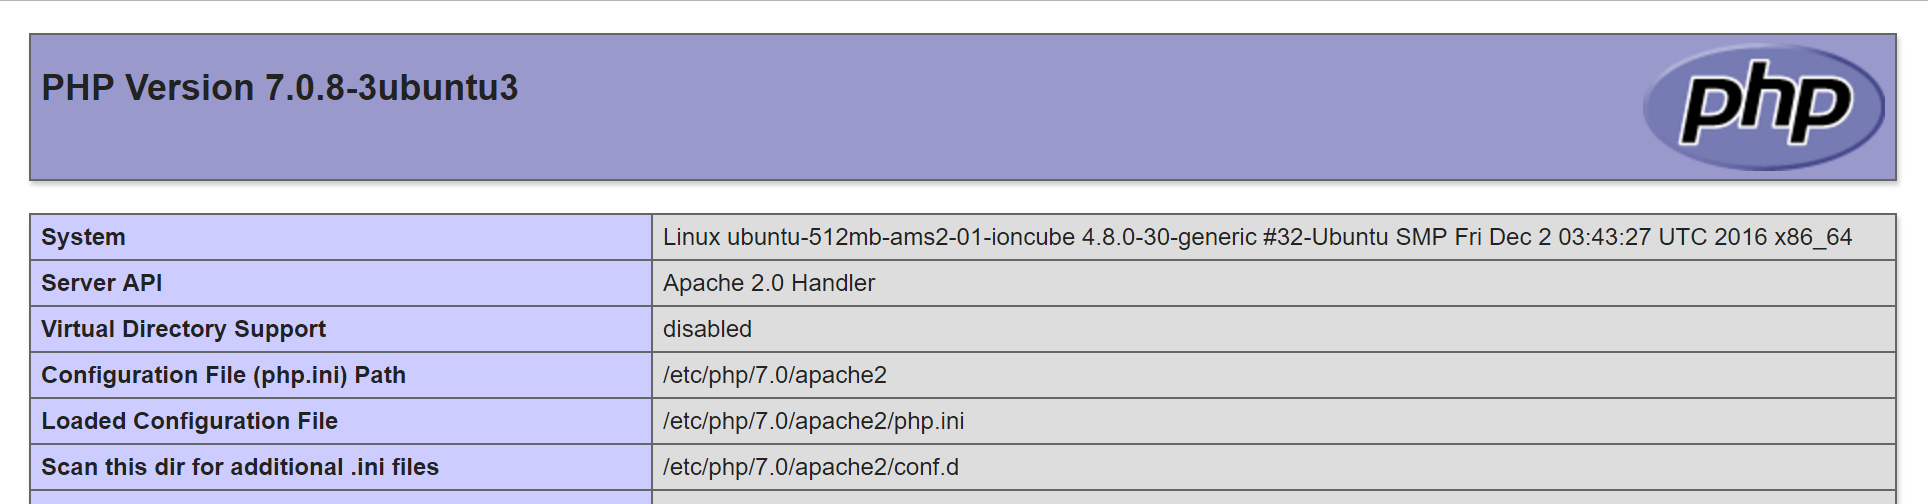 install php 7.2 ubuntu 18.04 digitalocean